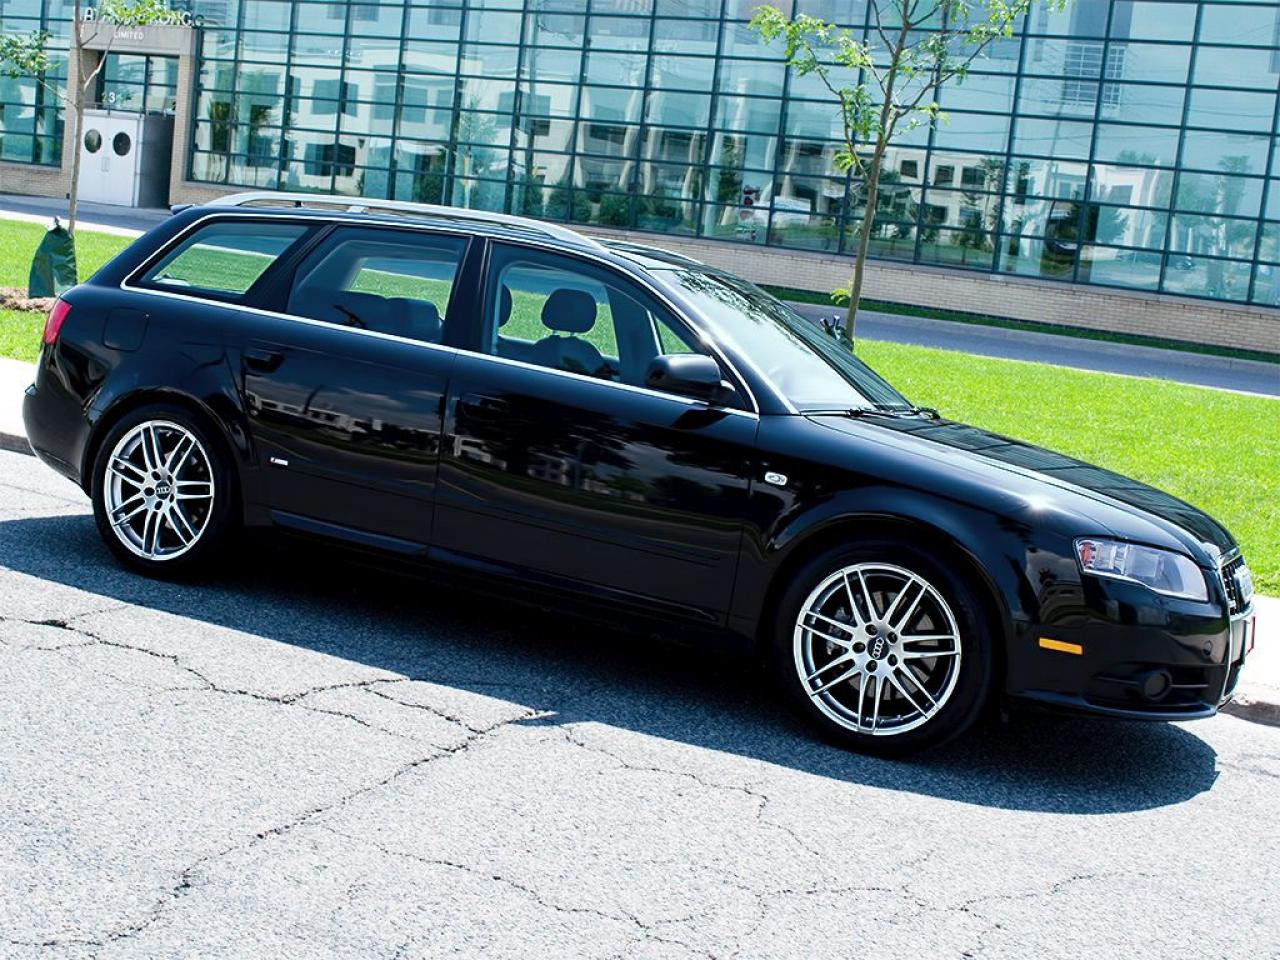 2007 Audi A4 3.2|S LINE|AVANT|LEATHER|SUNROOF|ALLOYS